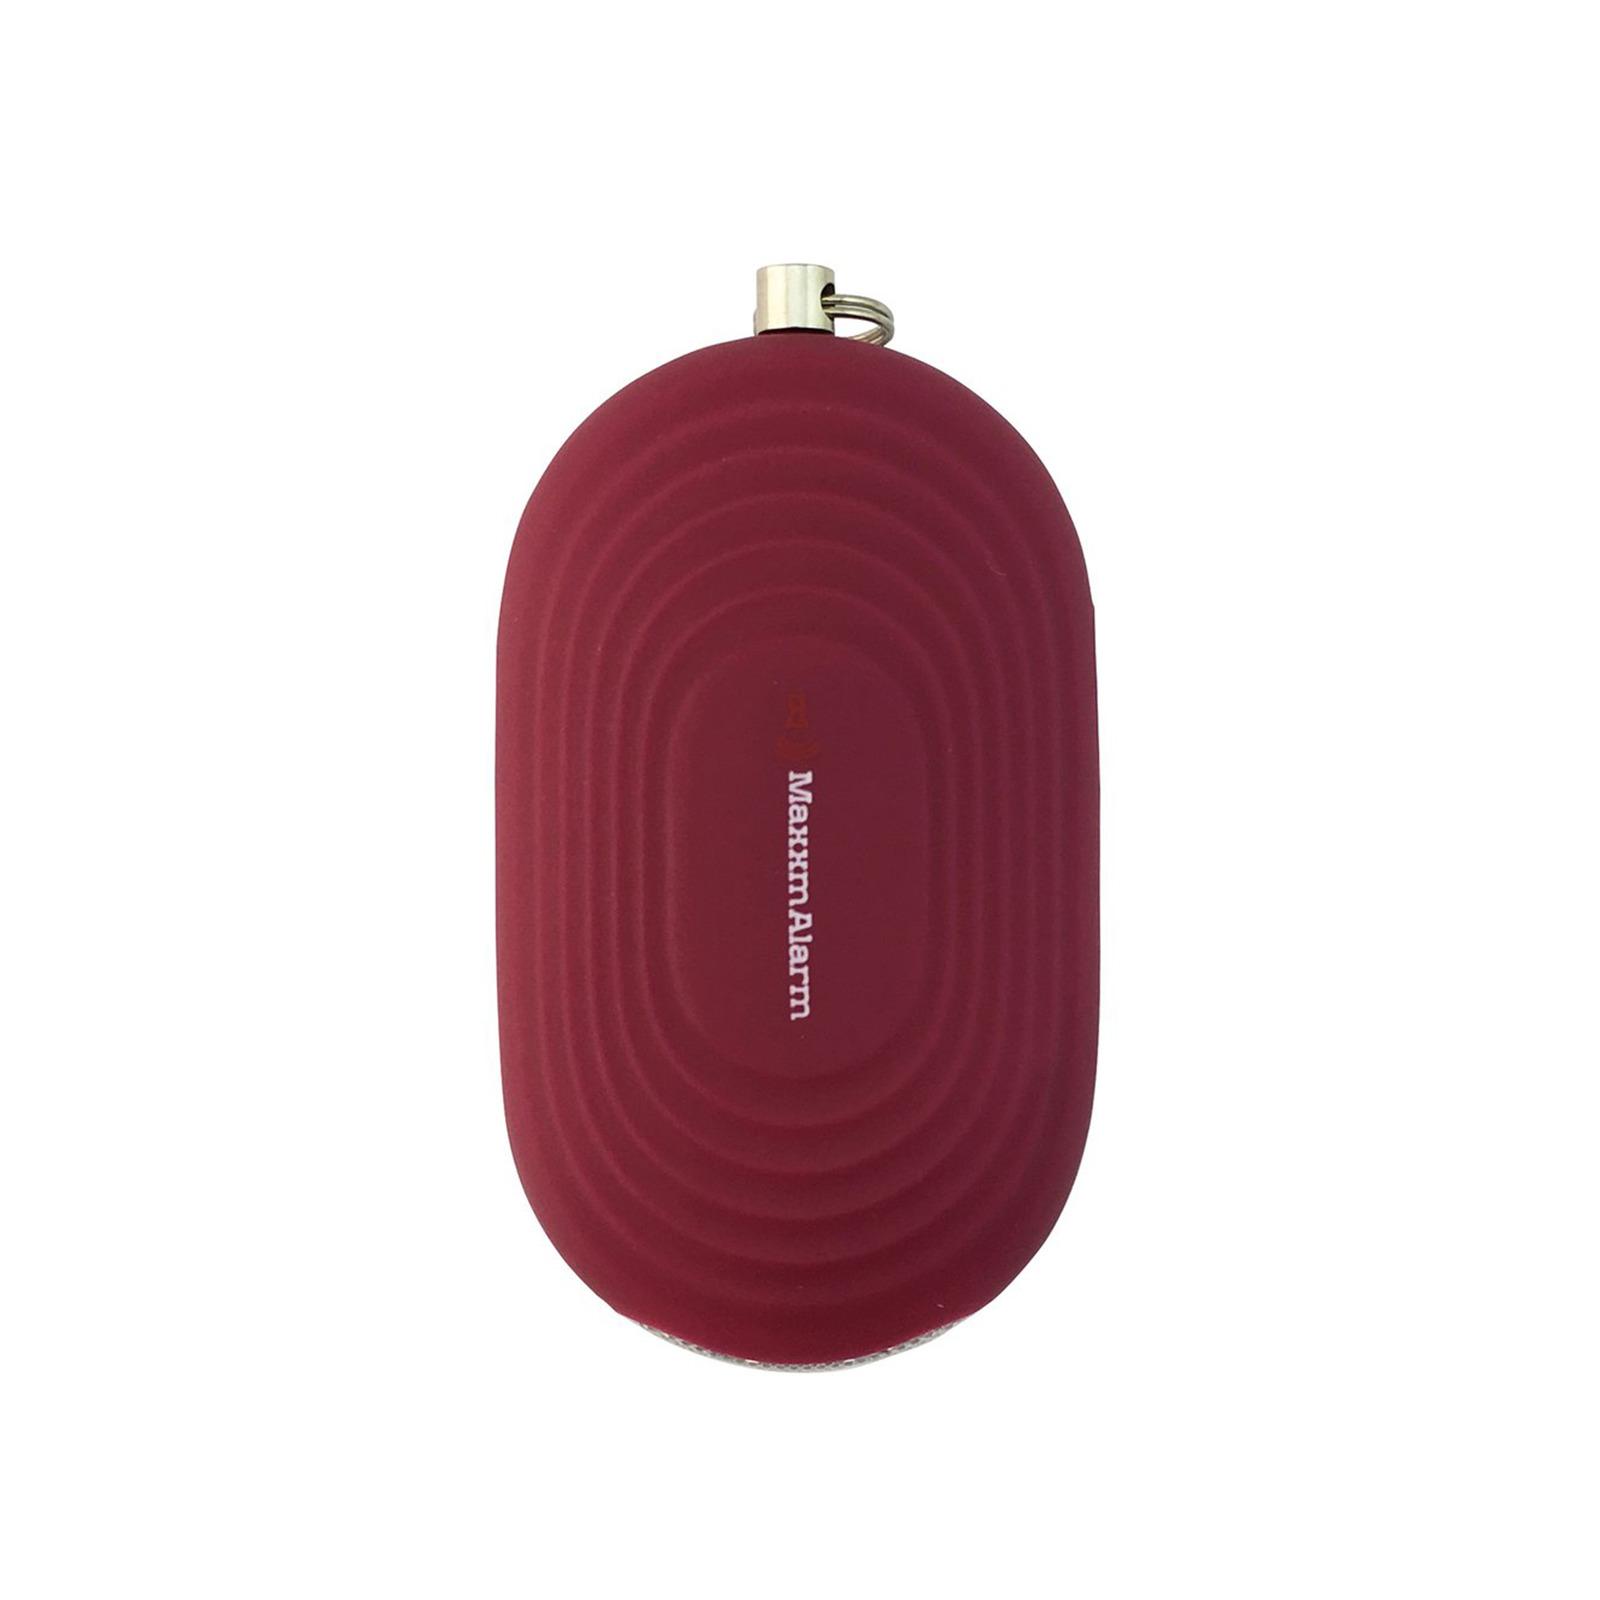 iMaxAlarm Portable Personal Alarm With Light (Matte Ruby)